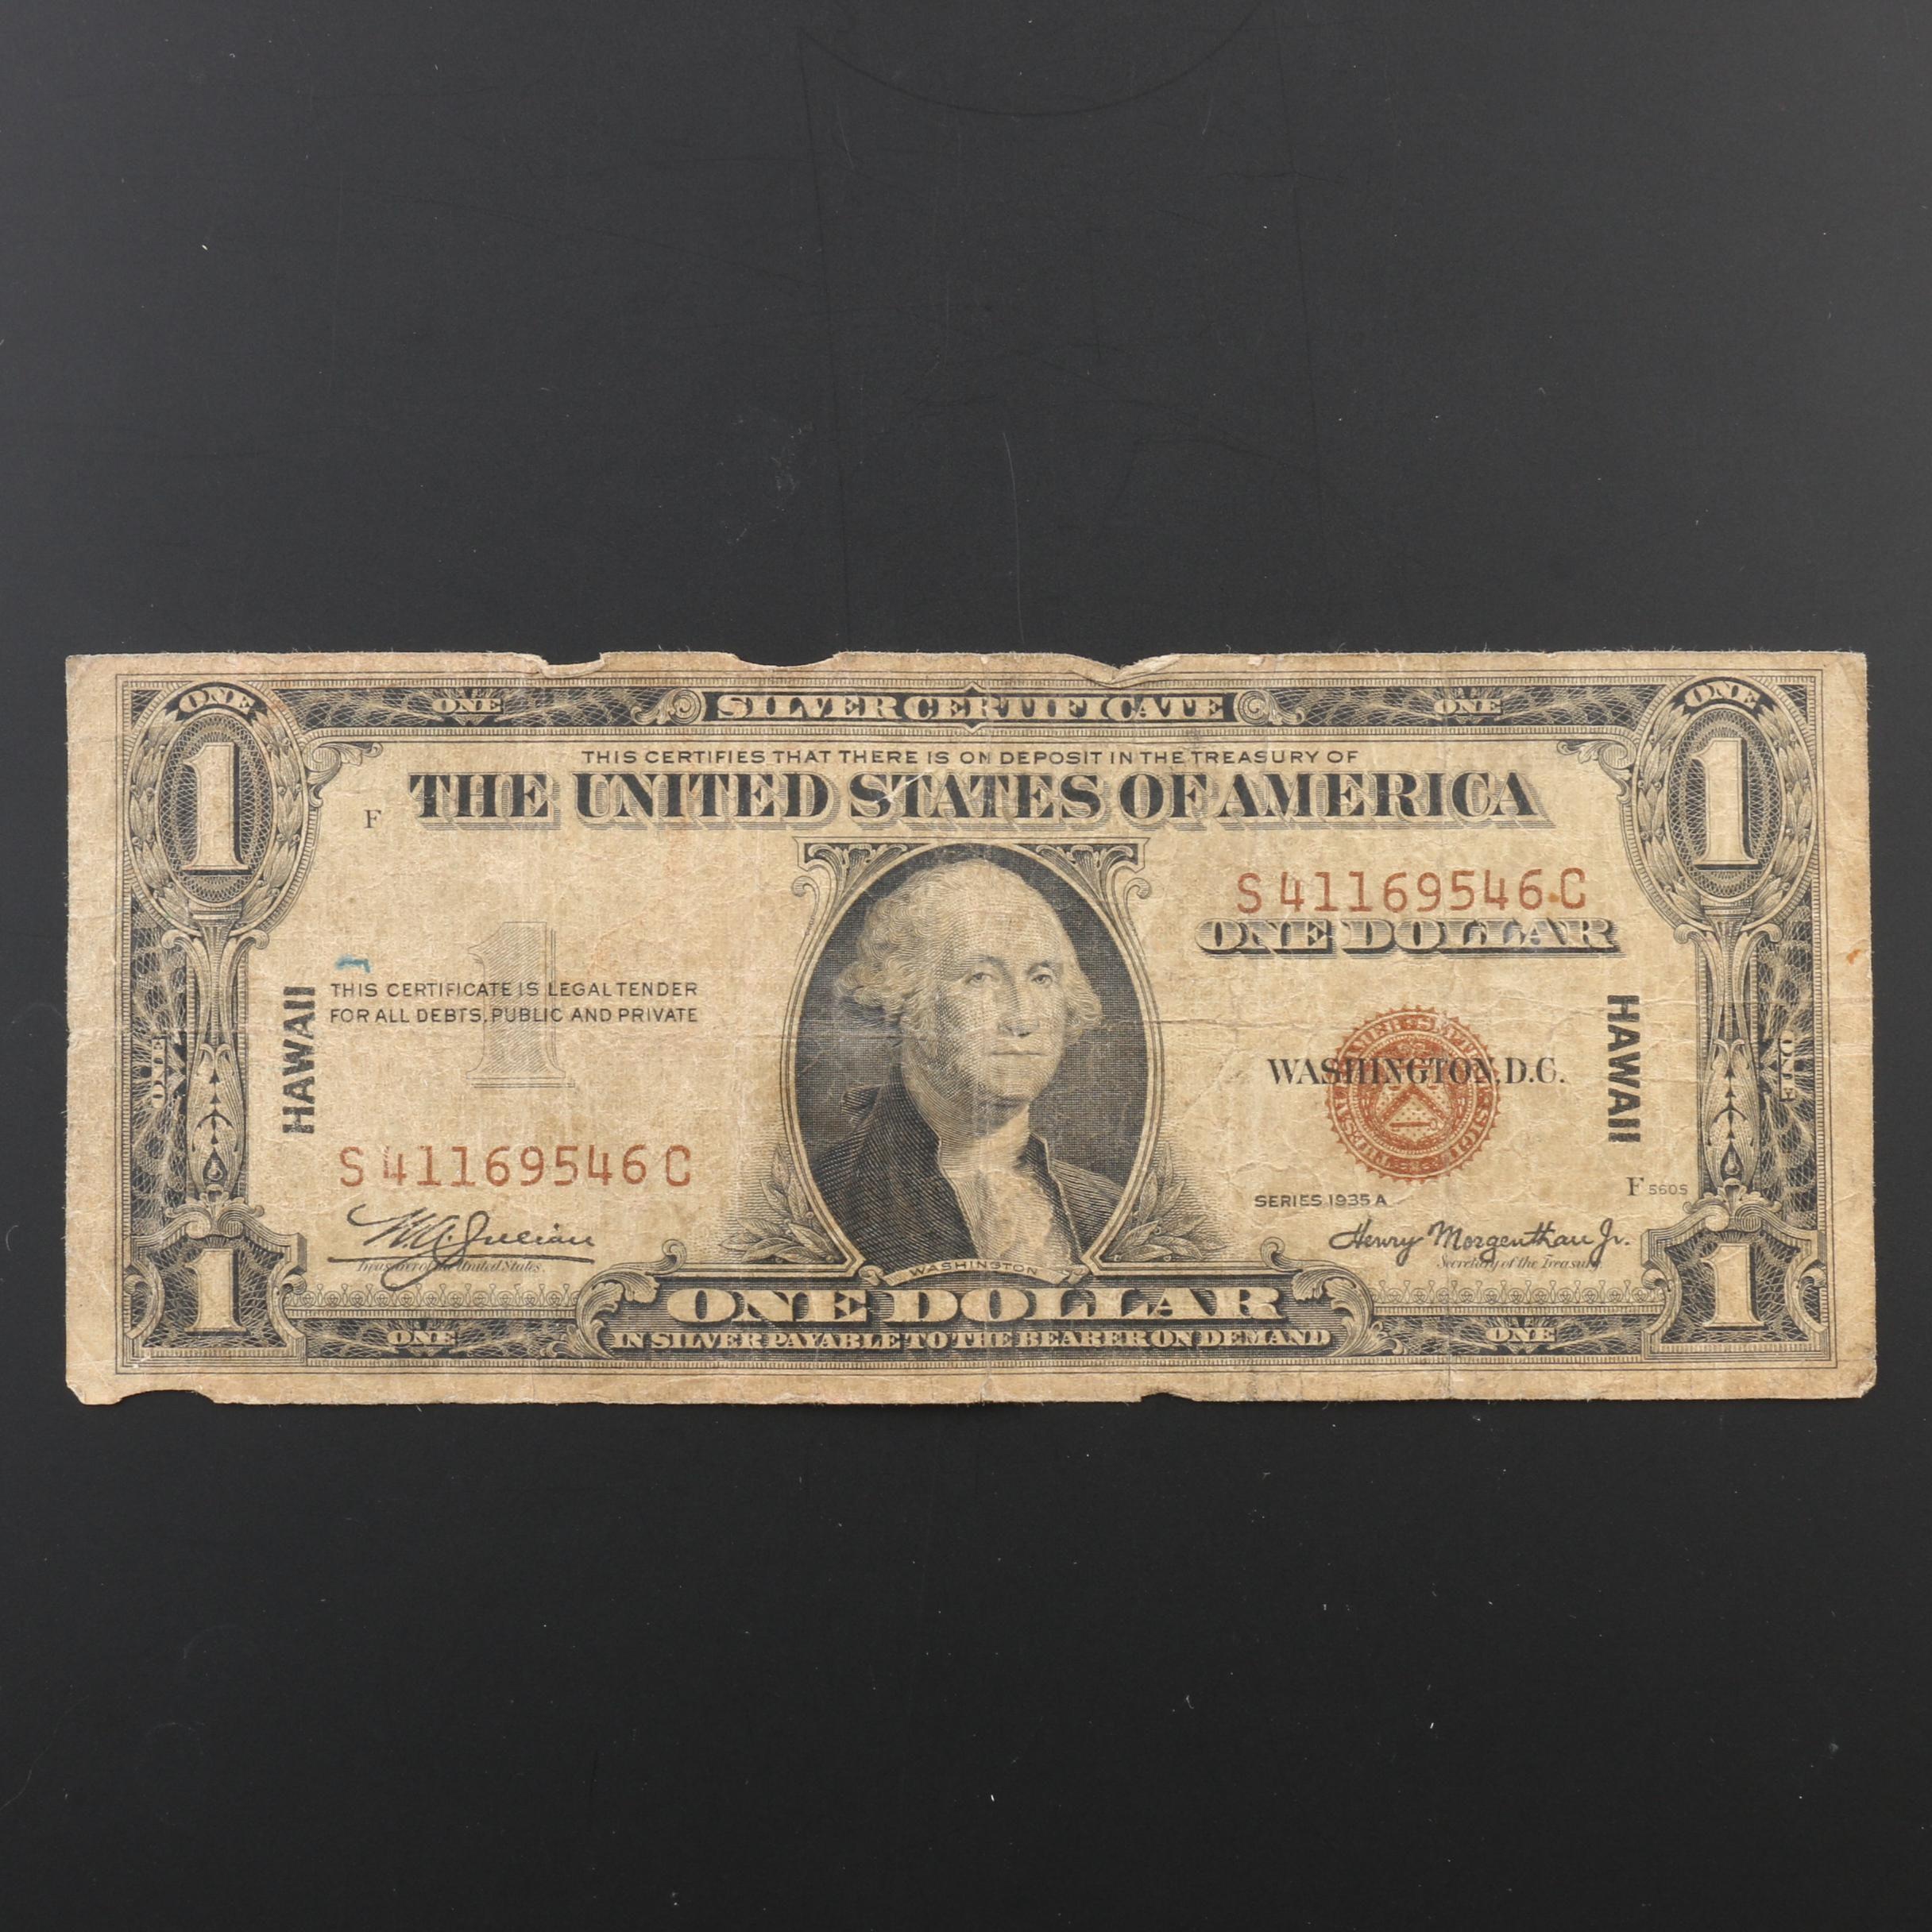 Series of 1935-A Hawaii $1 Brown Seal Silver Certificate